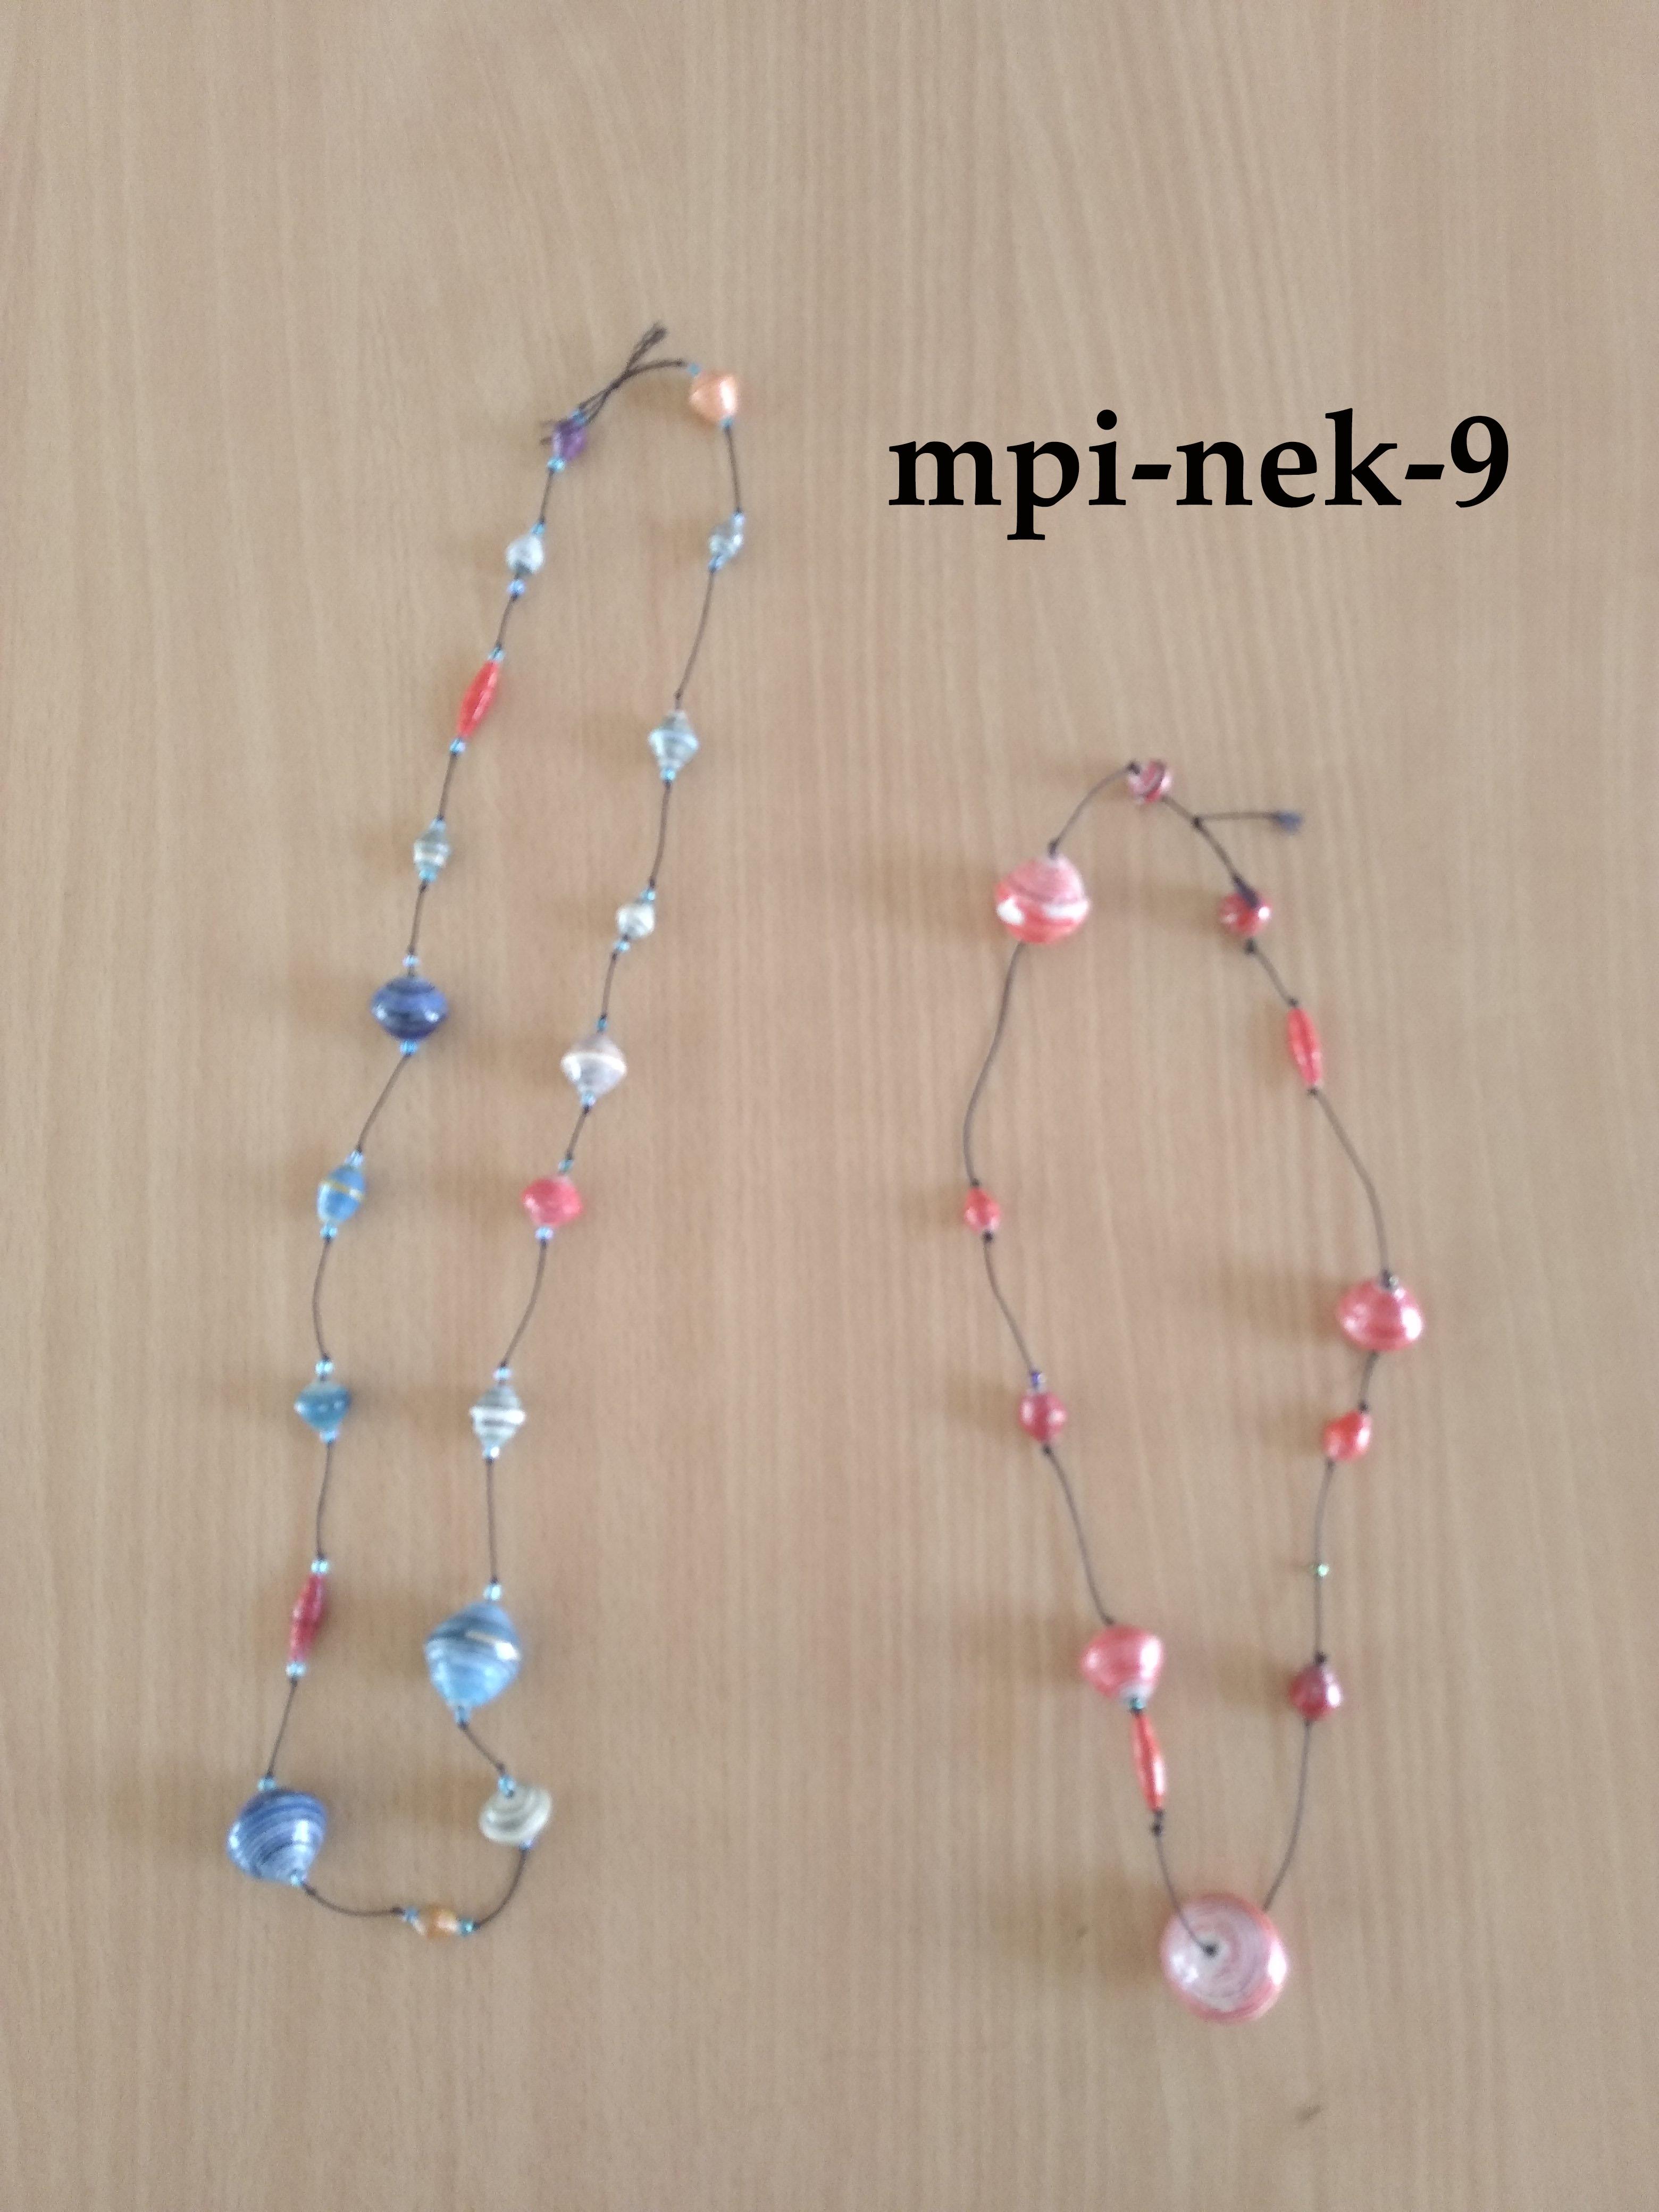 mpi-nek-9